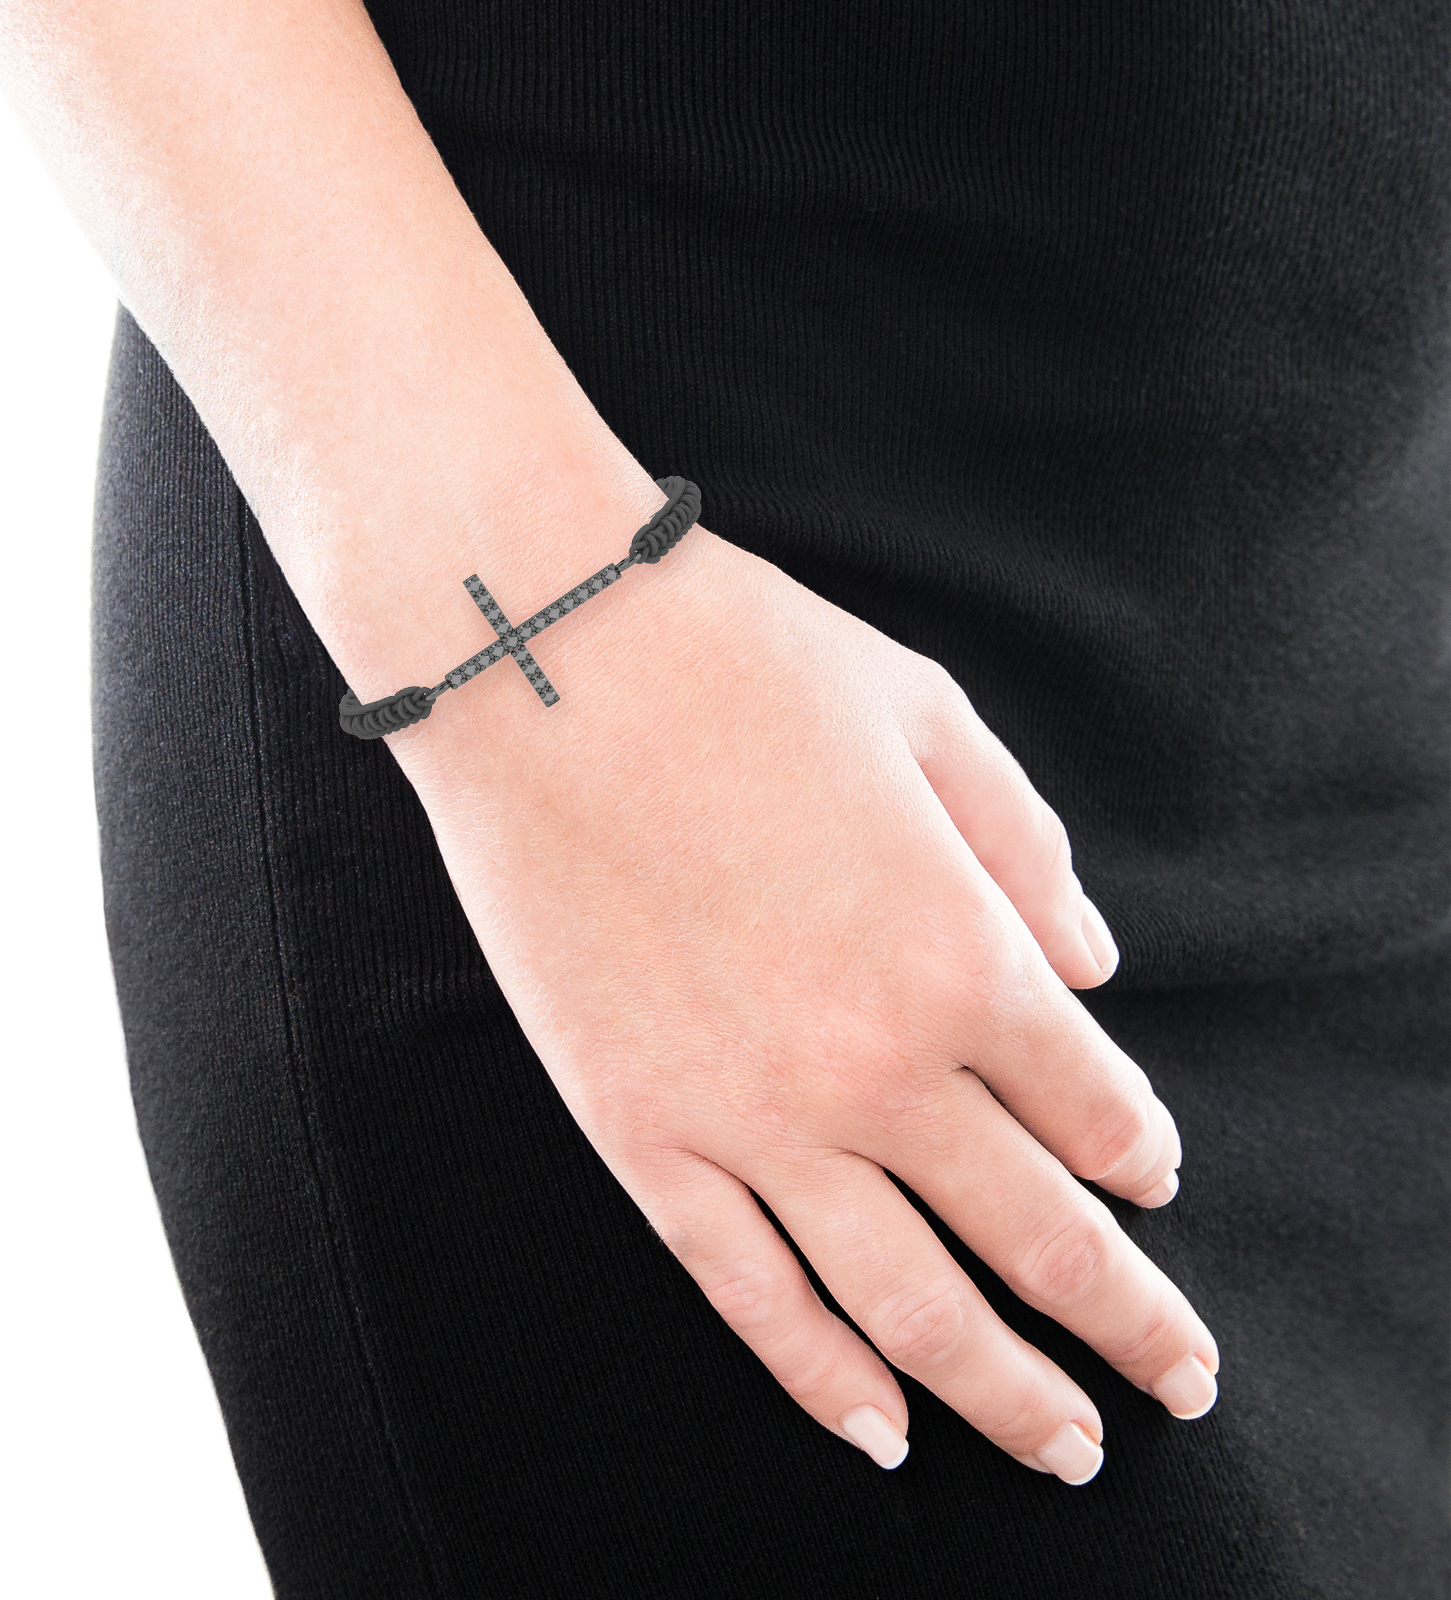 Bracelet in sterling silver with black diamonds